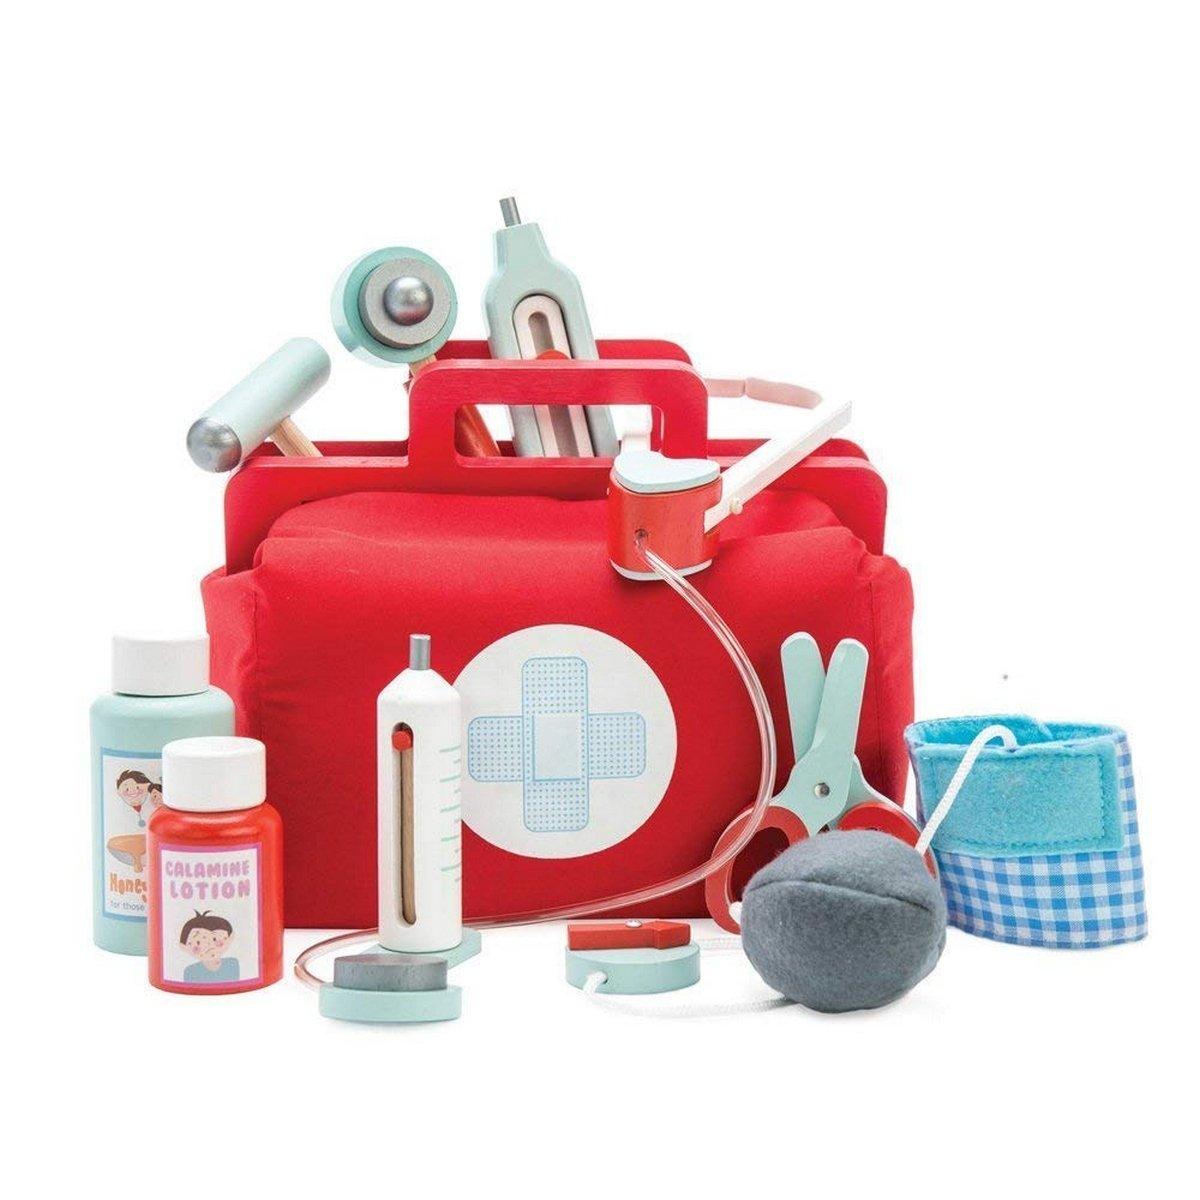 Le Toy Van - Honeybake Doctor's Set (Ltv292)